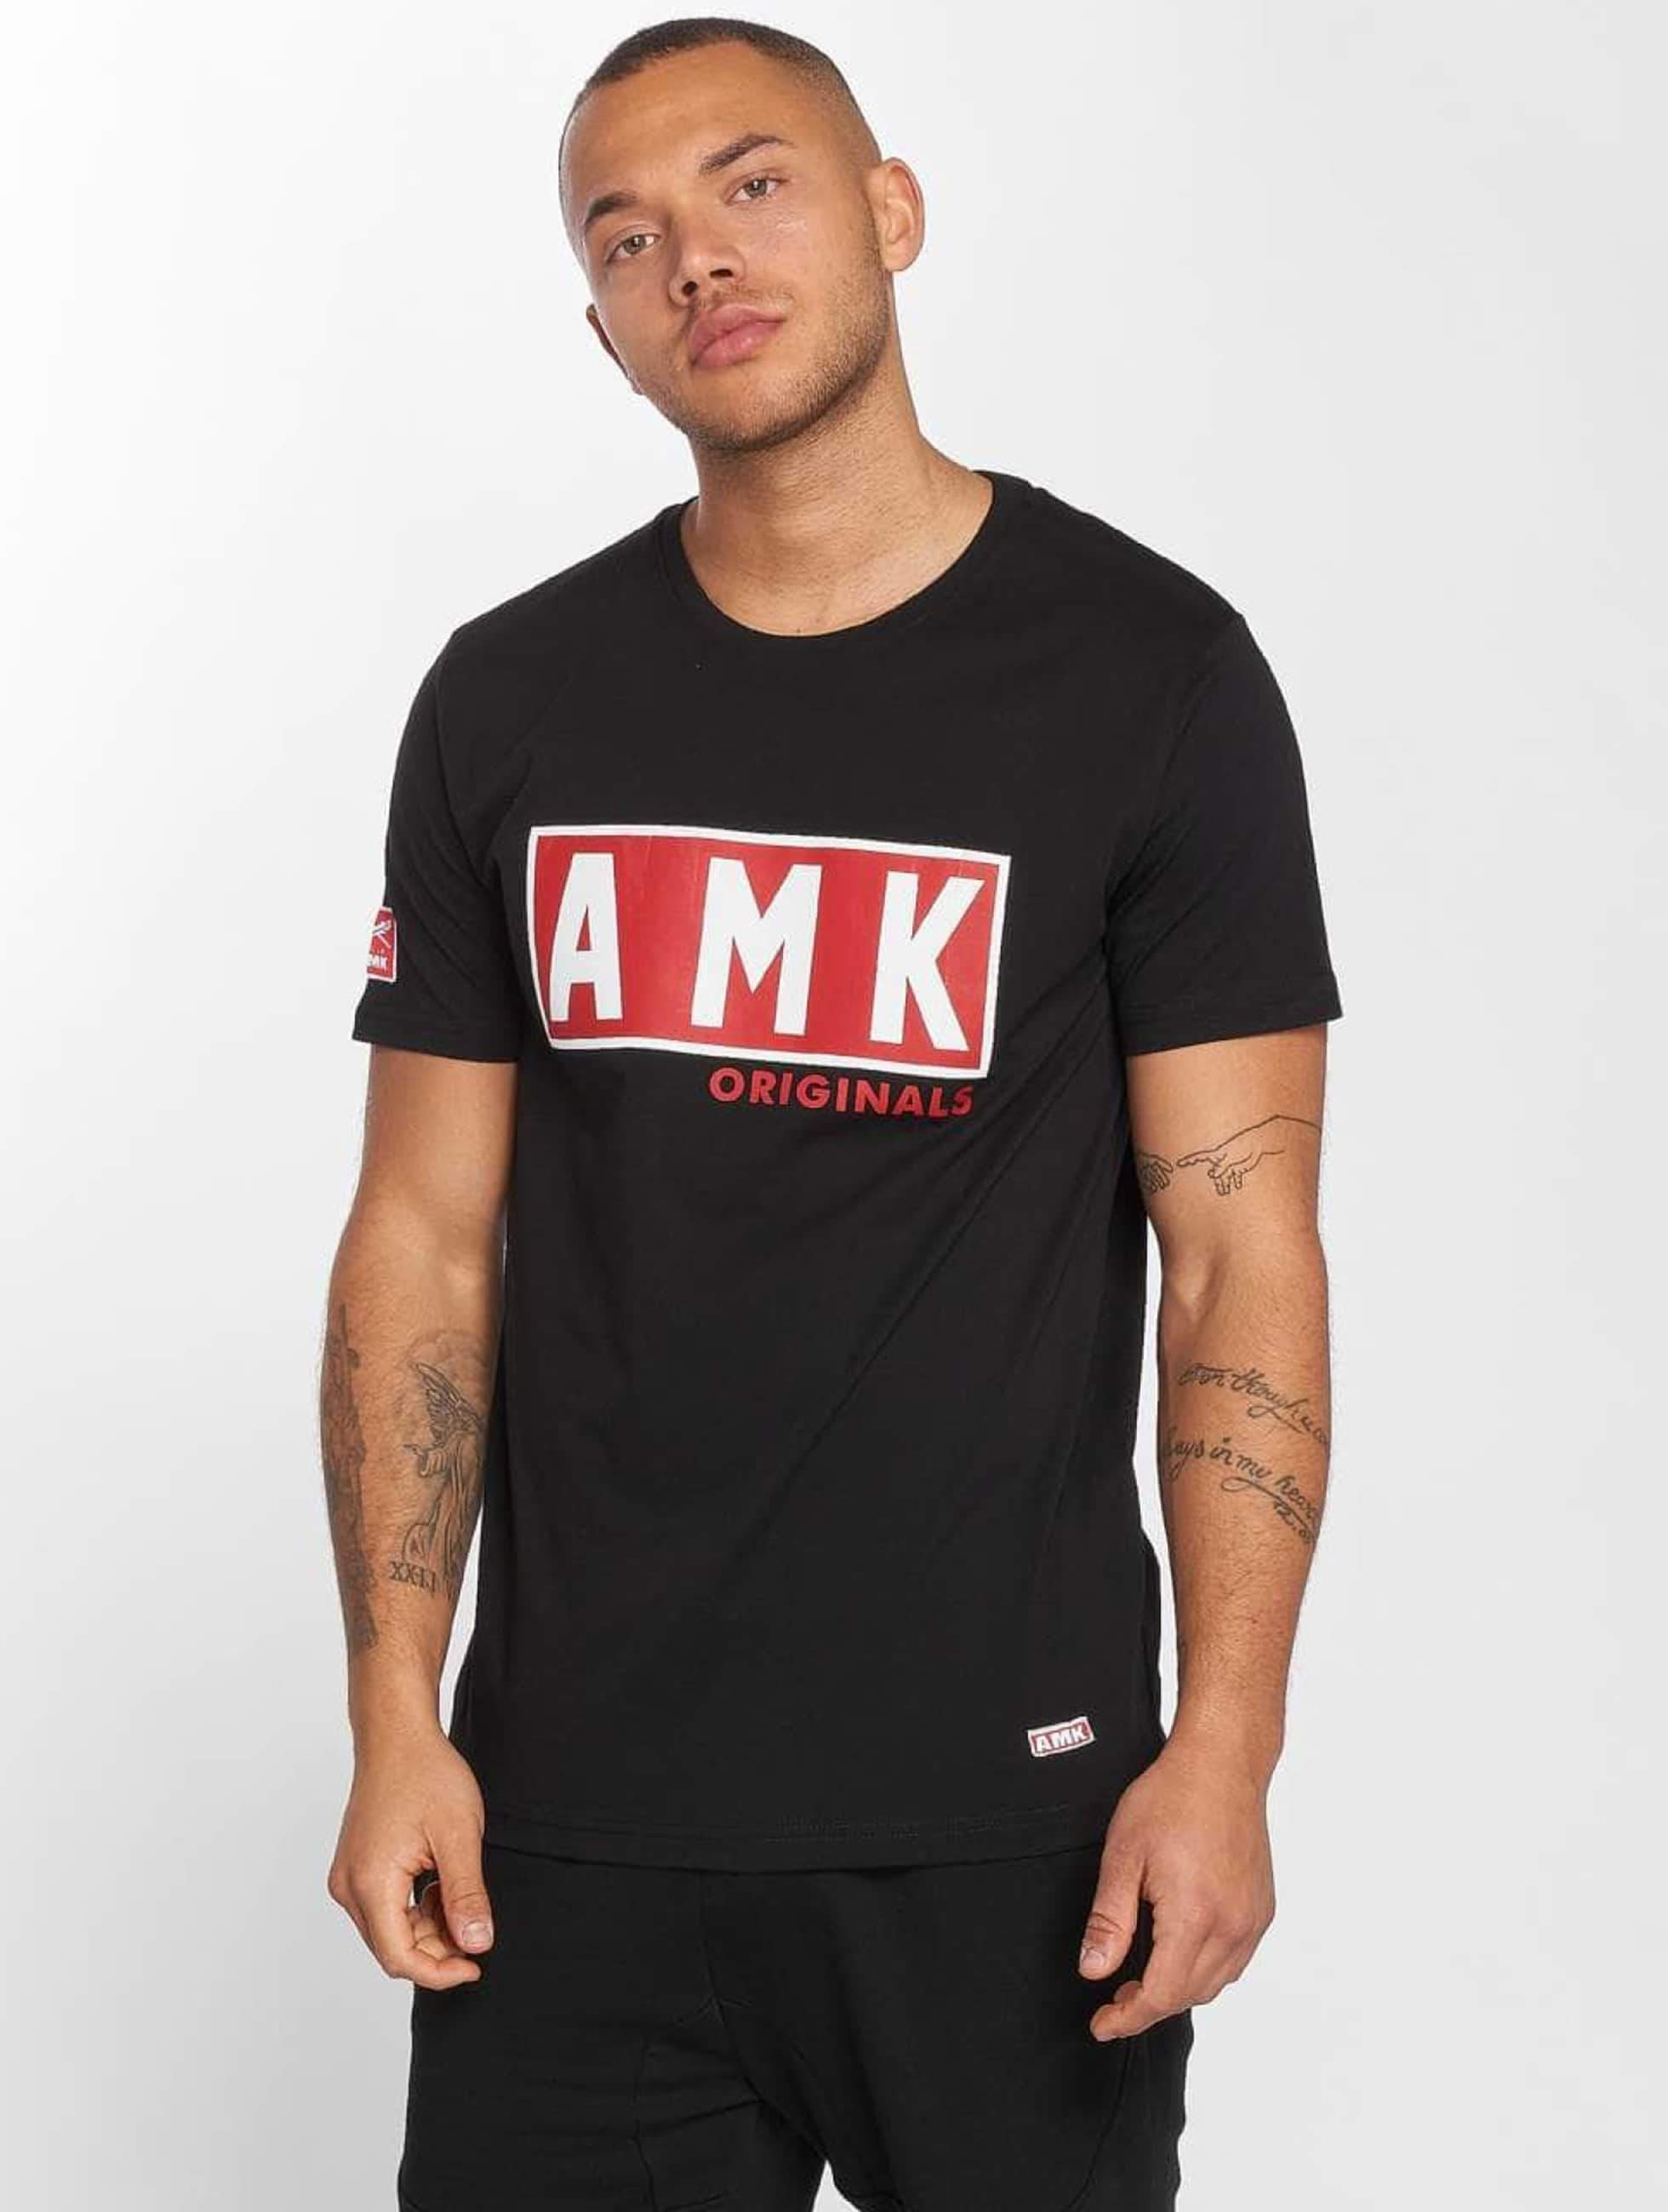 AMK | Original noir Homme T-Shirt